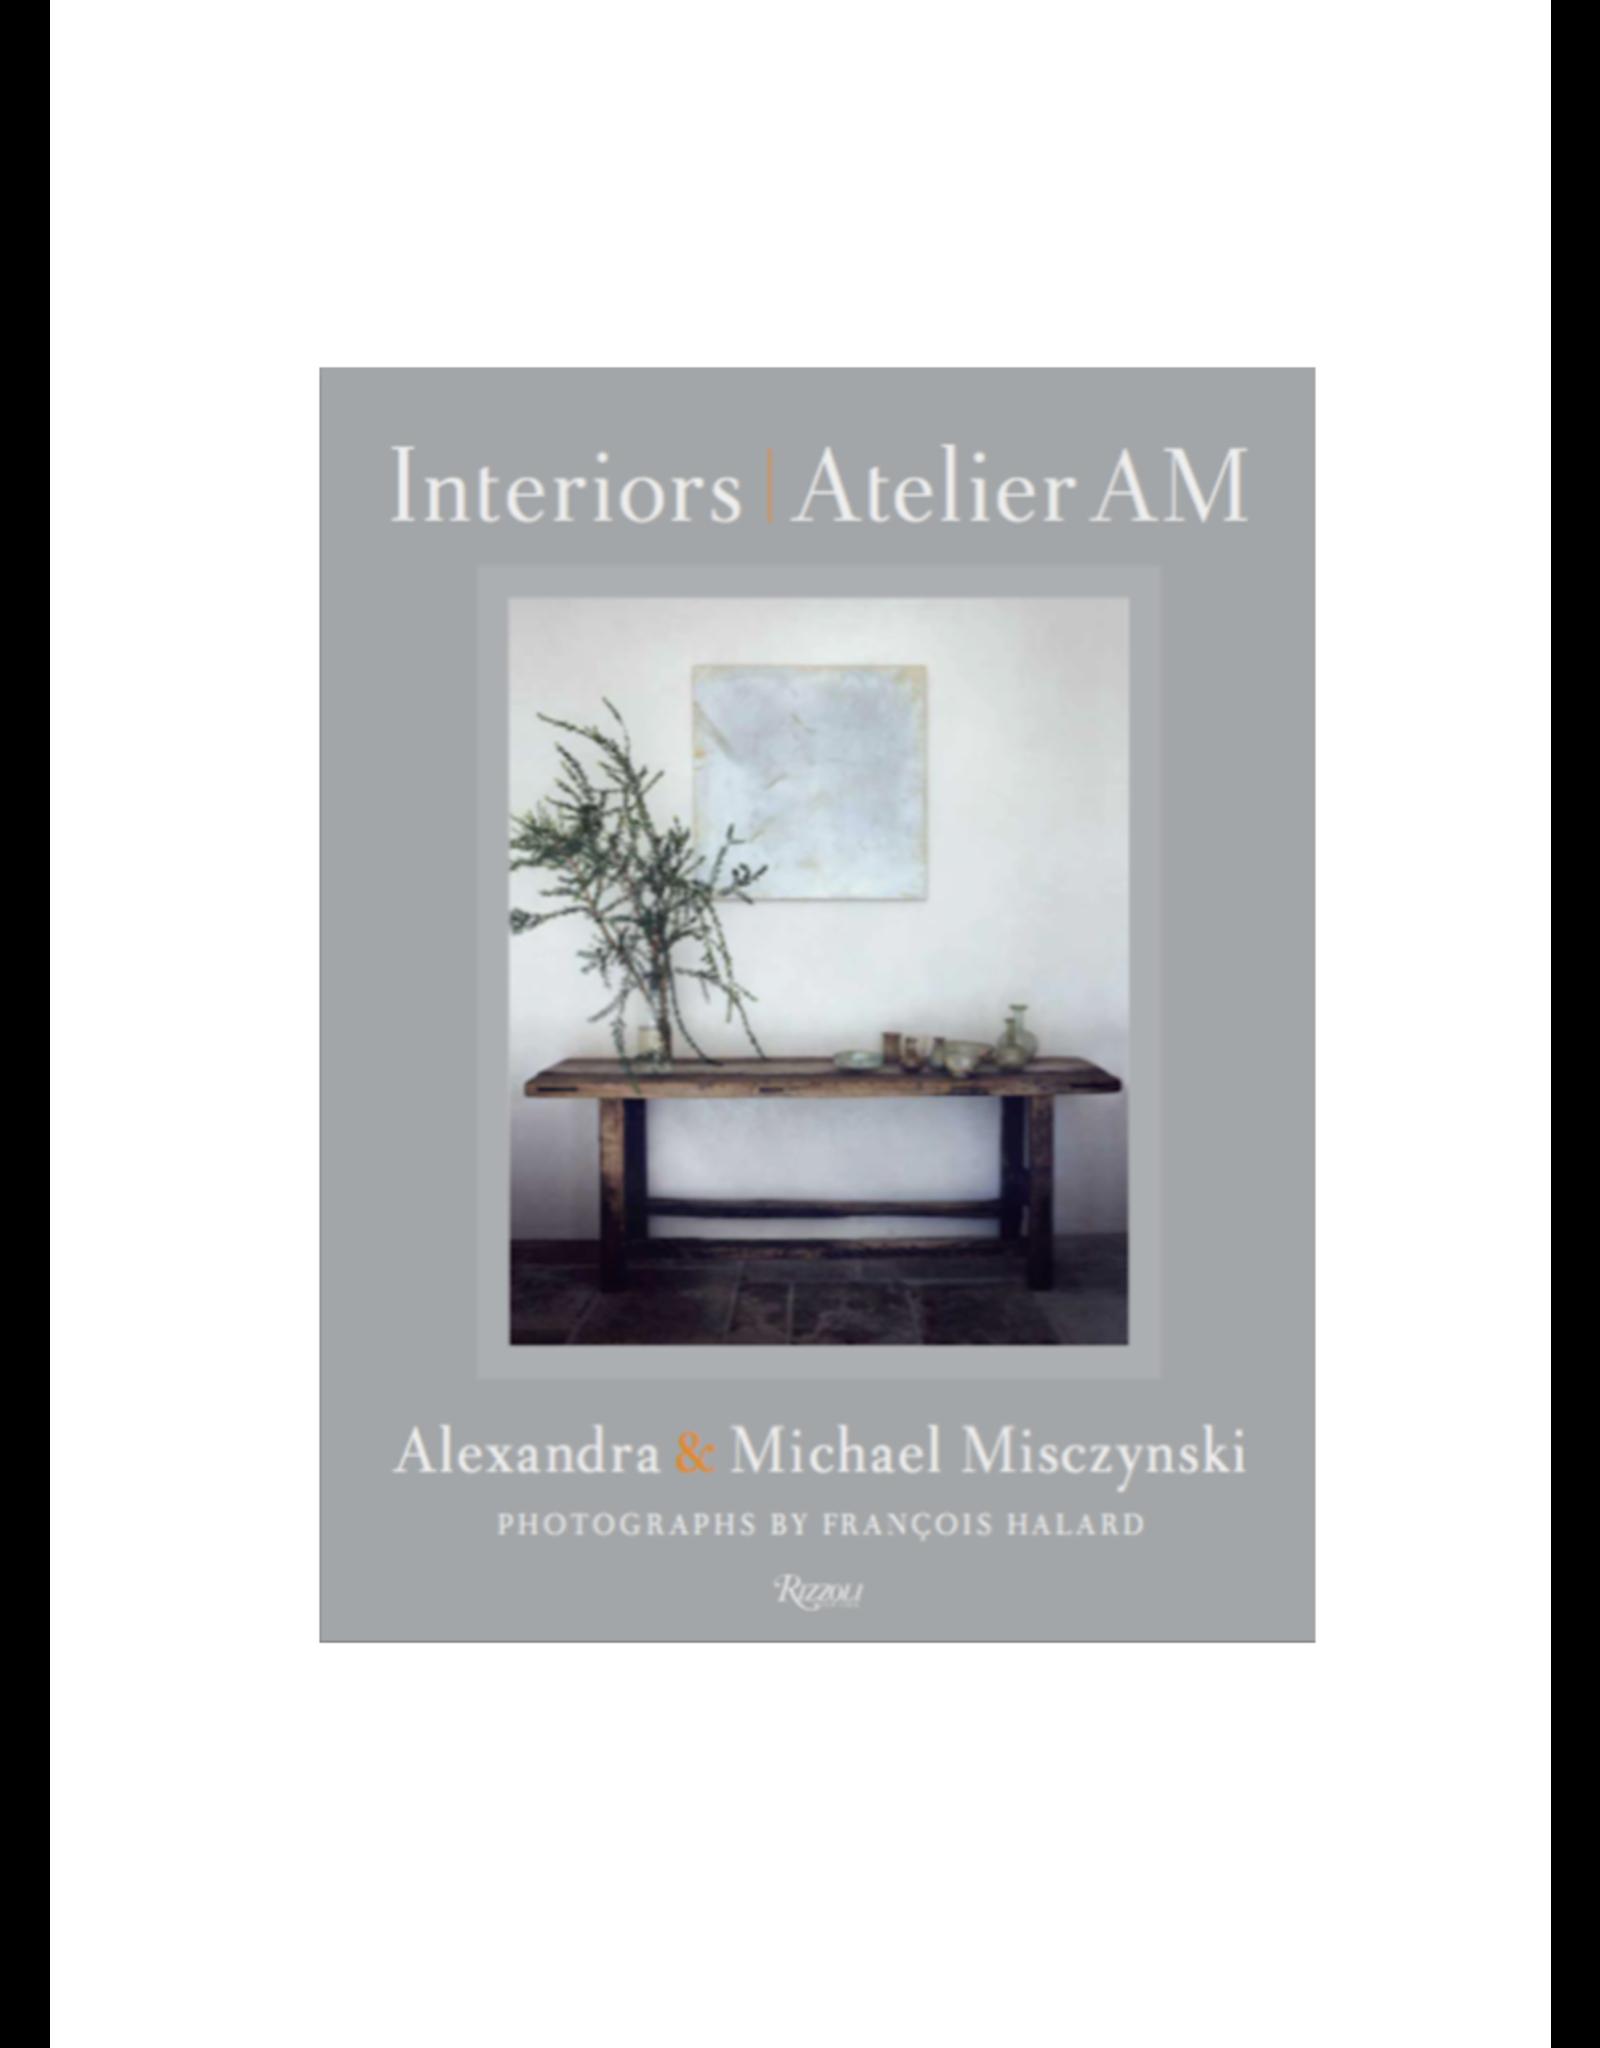 Interiors Atelier